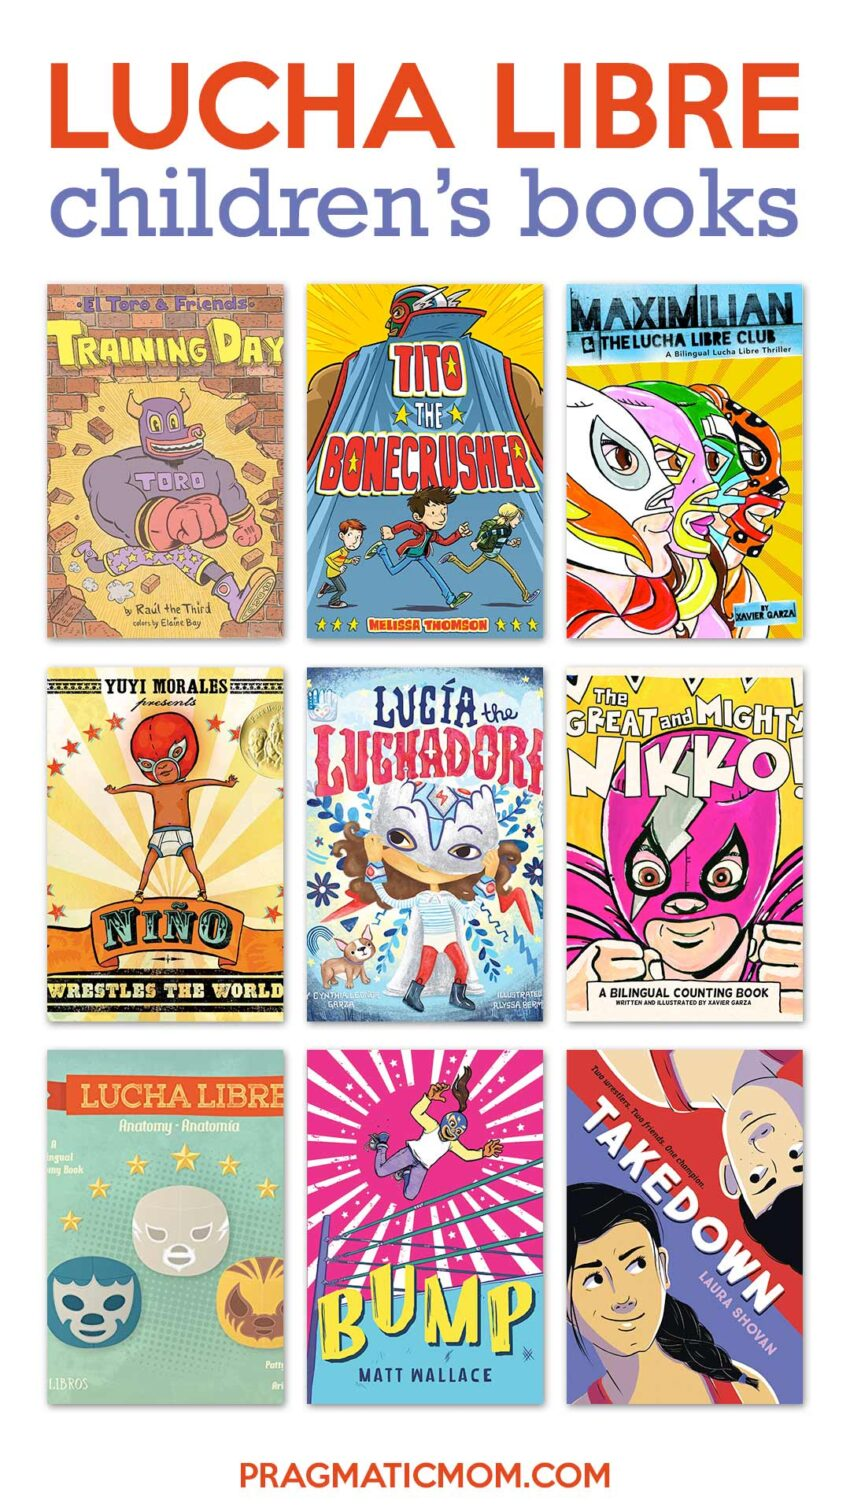 Lucha Libre Children's Books